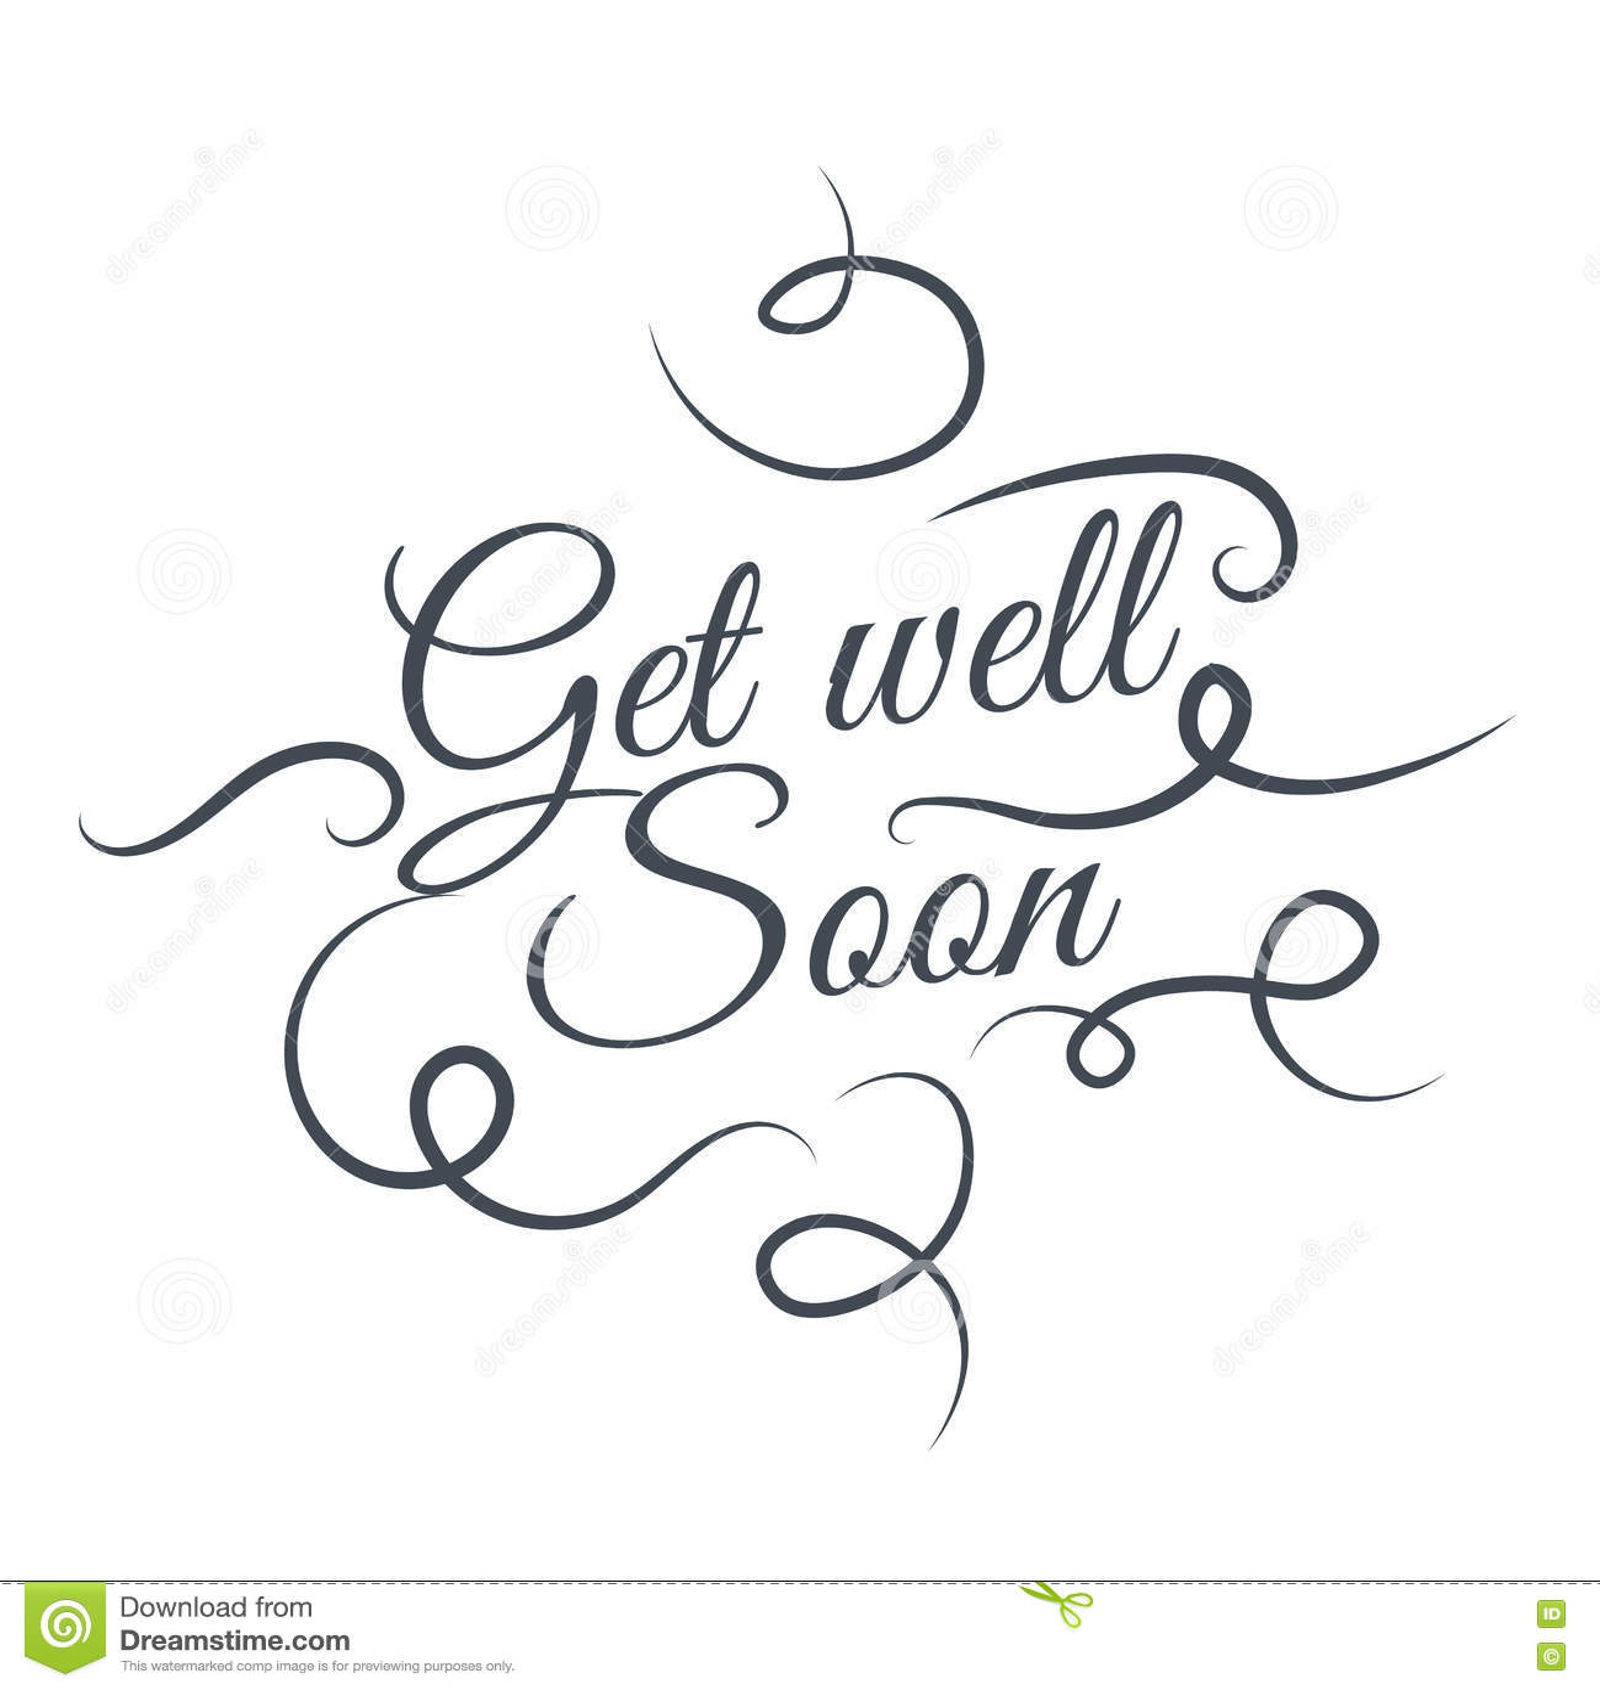 Get Well Soon Brush Lettering RoyaltyFree Stock Photo